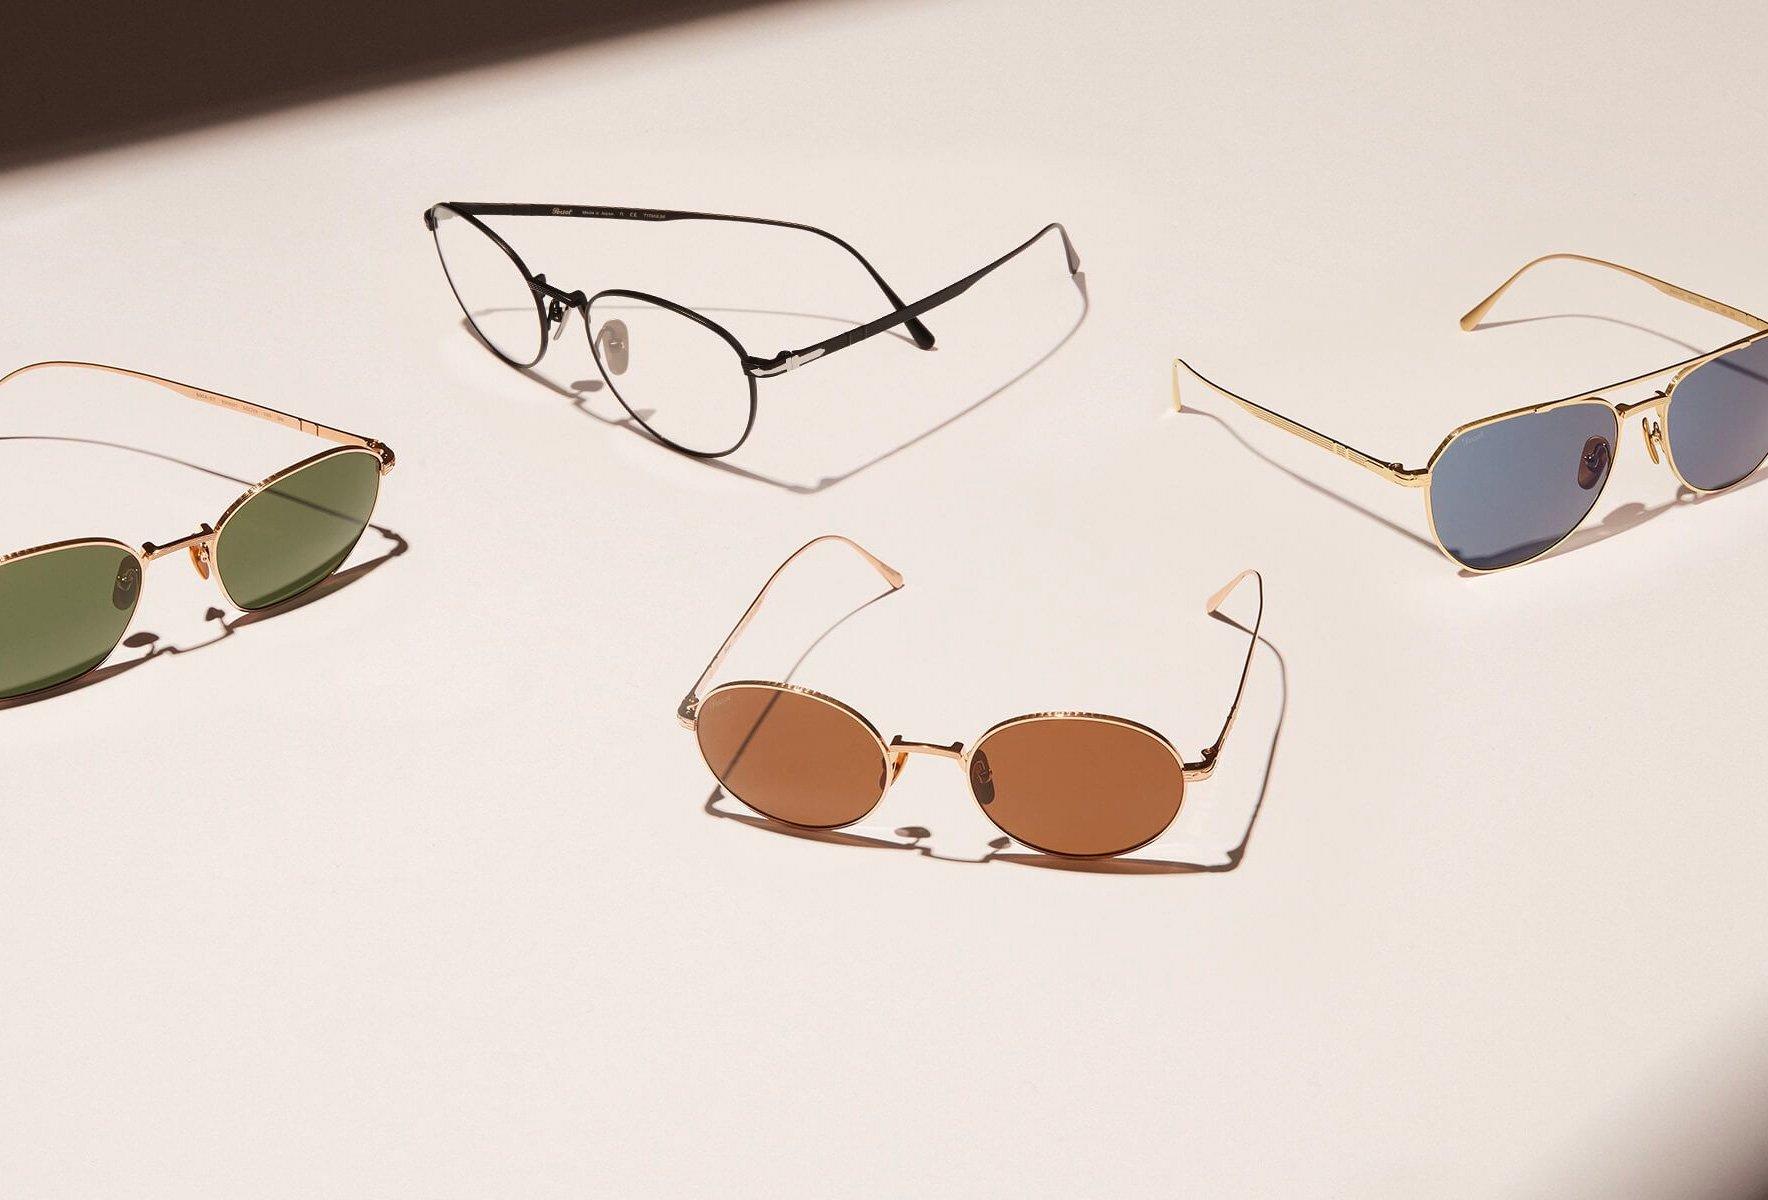 Persol's Titanium Collection Mixes Italian Style & Japanese Craftsmanship at werd.com